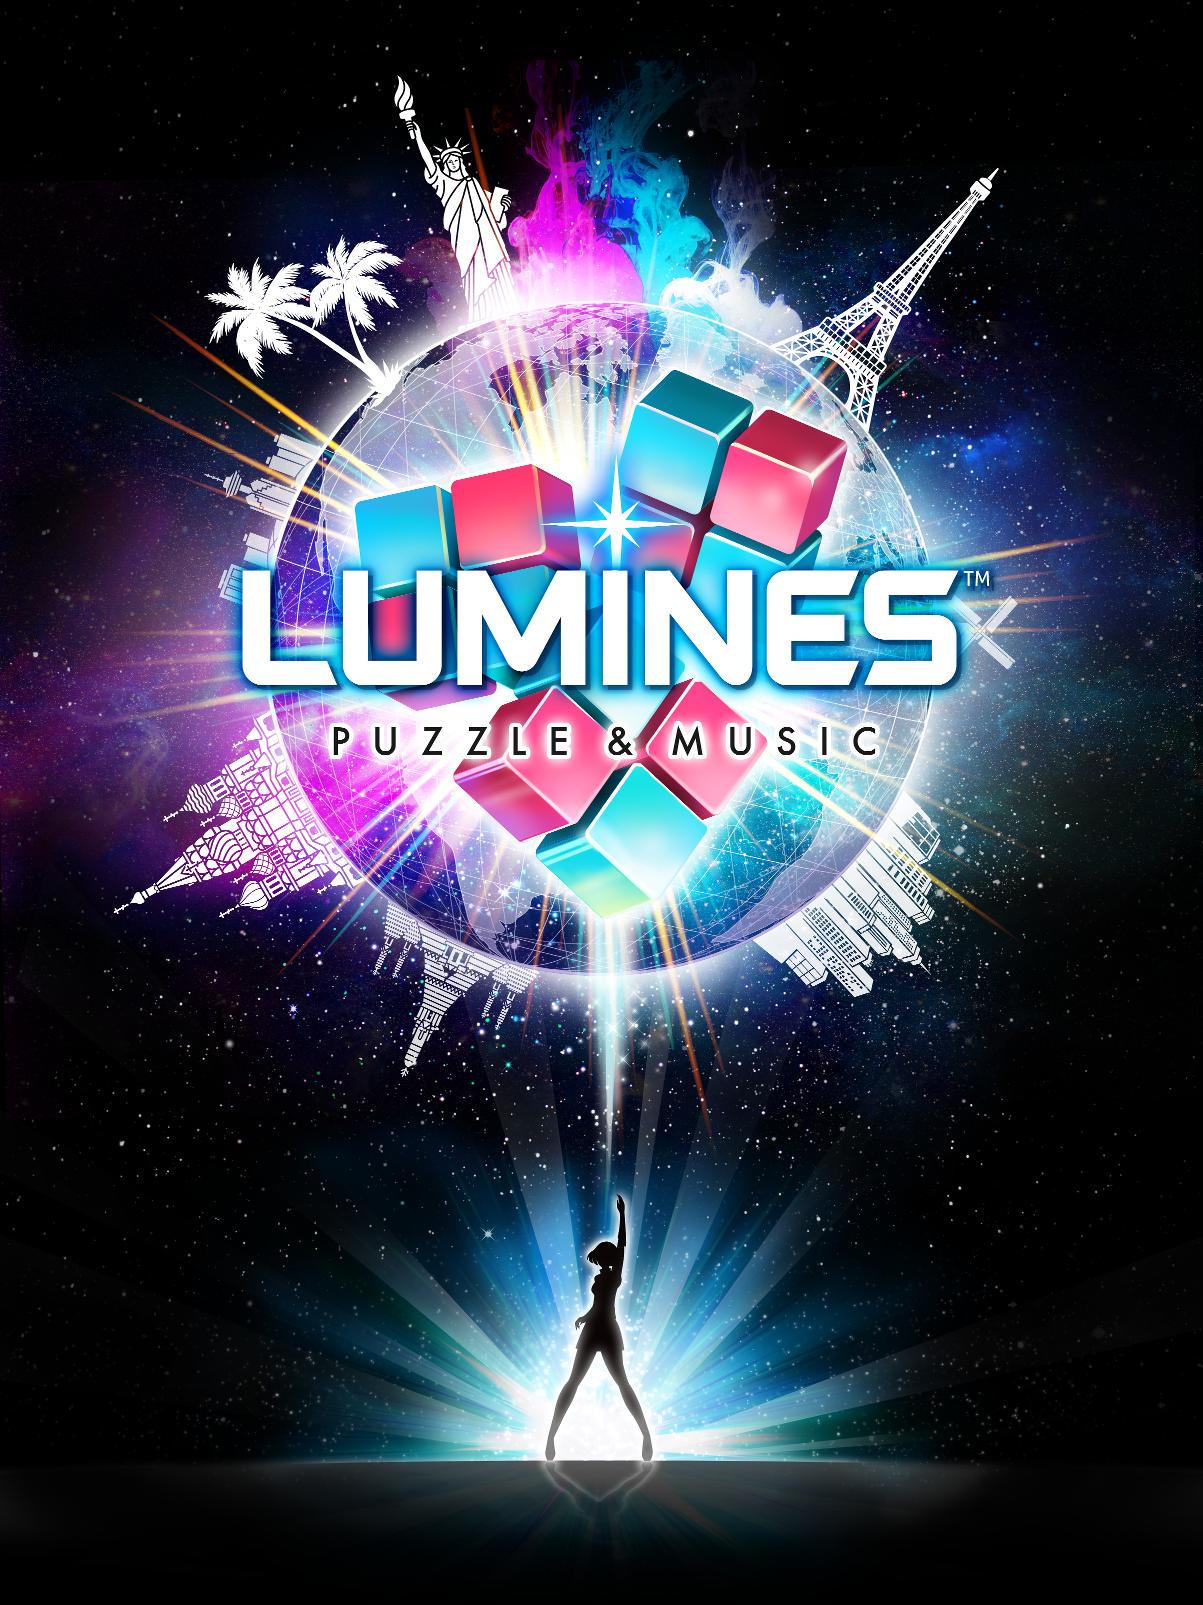 lumines2016keyvisual_160624_2